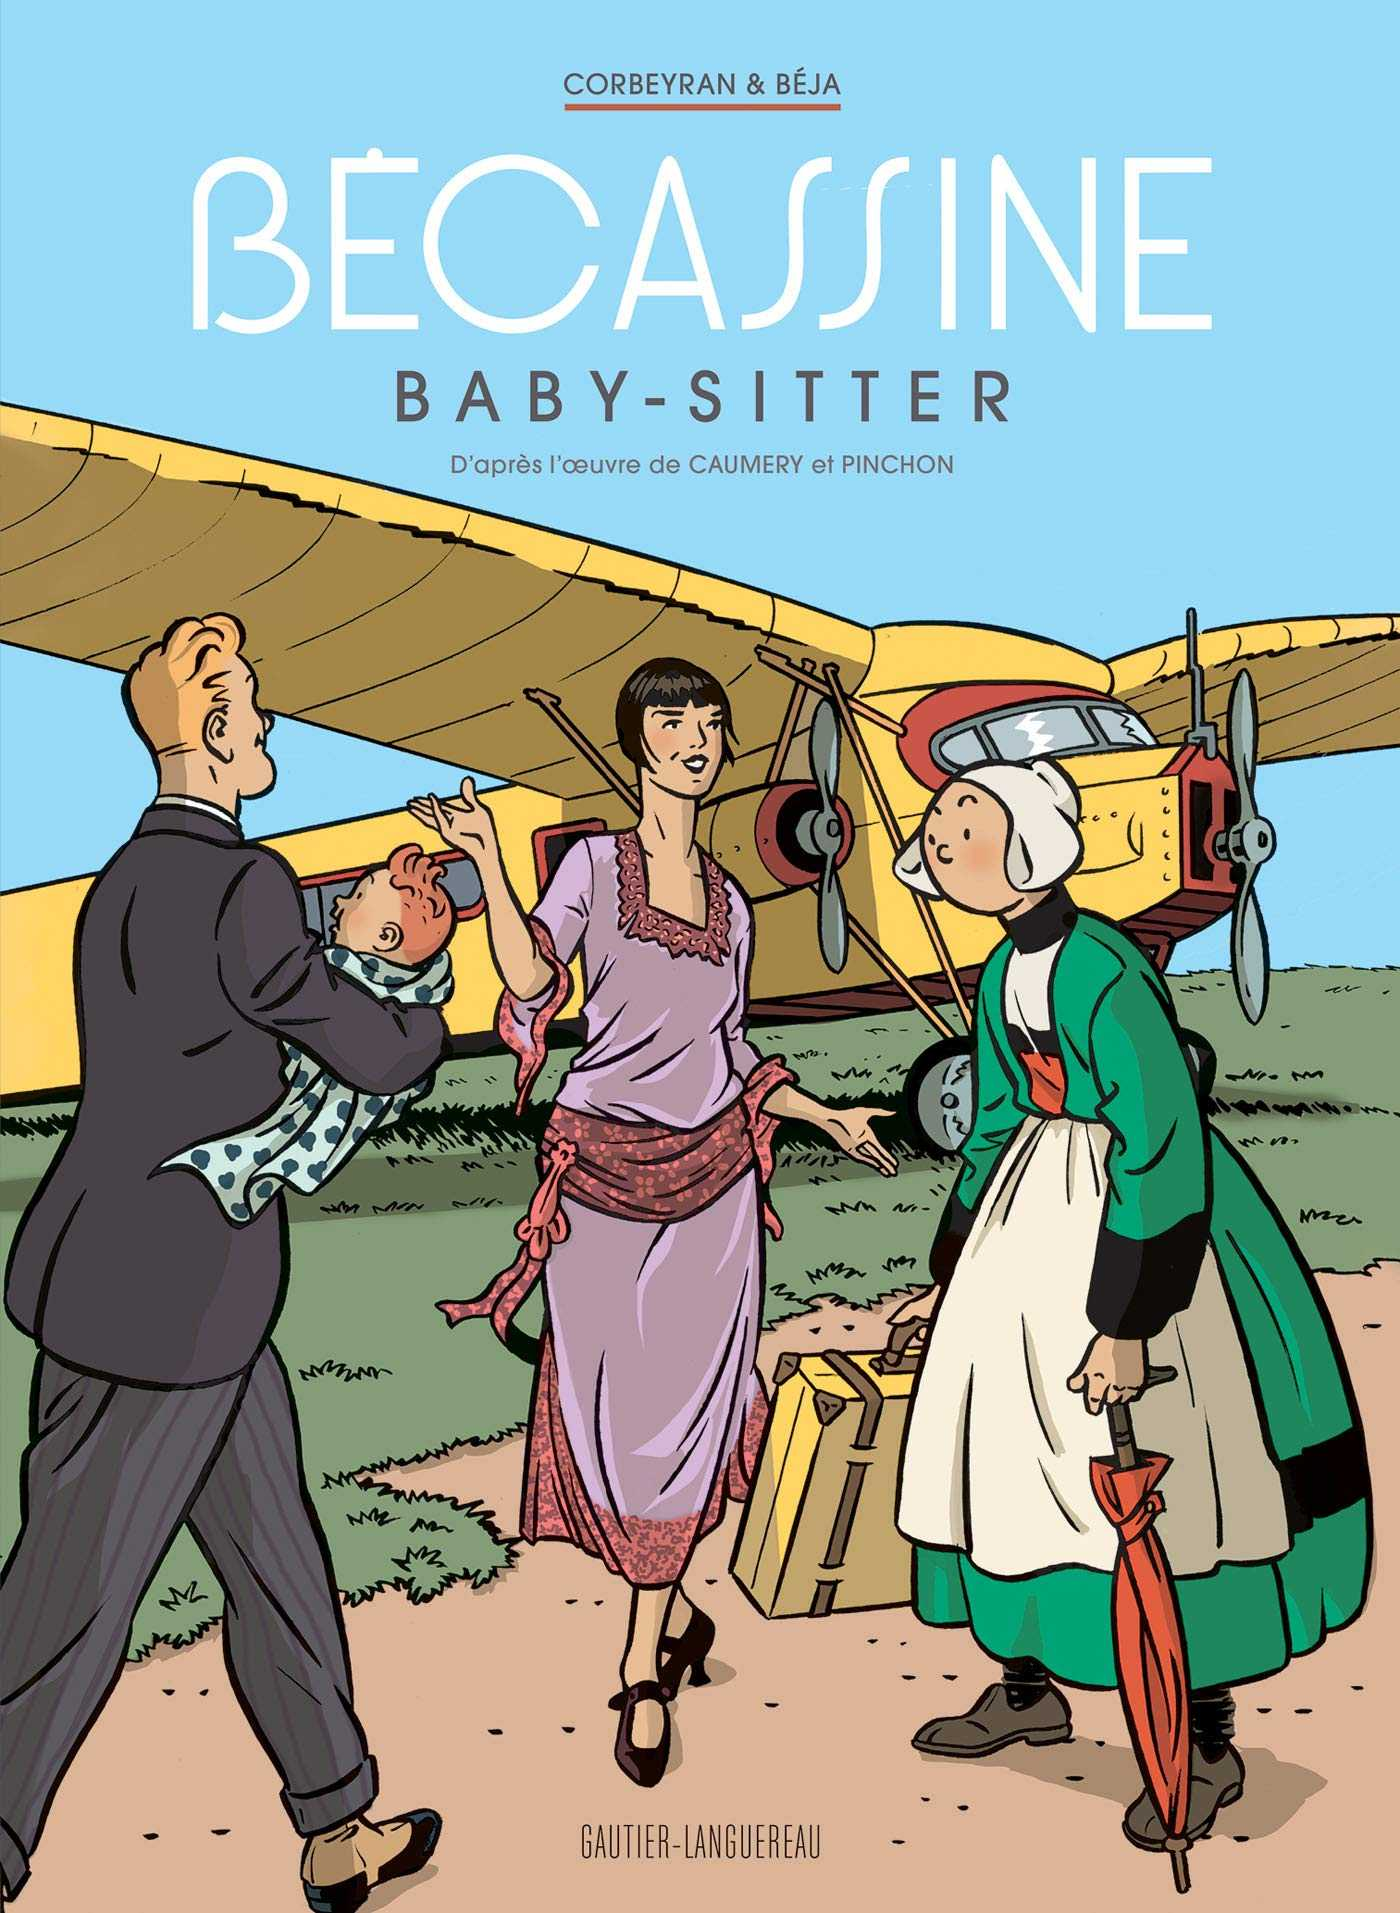 Bécassine de retour en baby-sitter